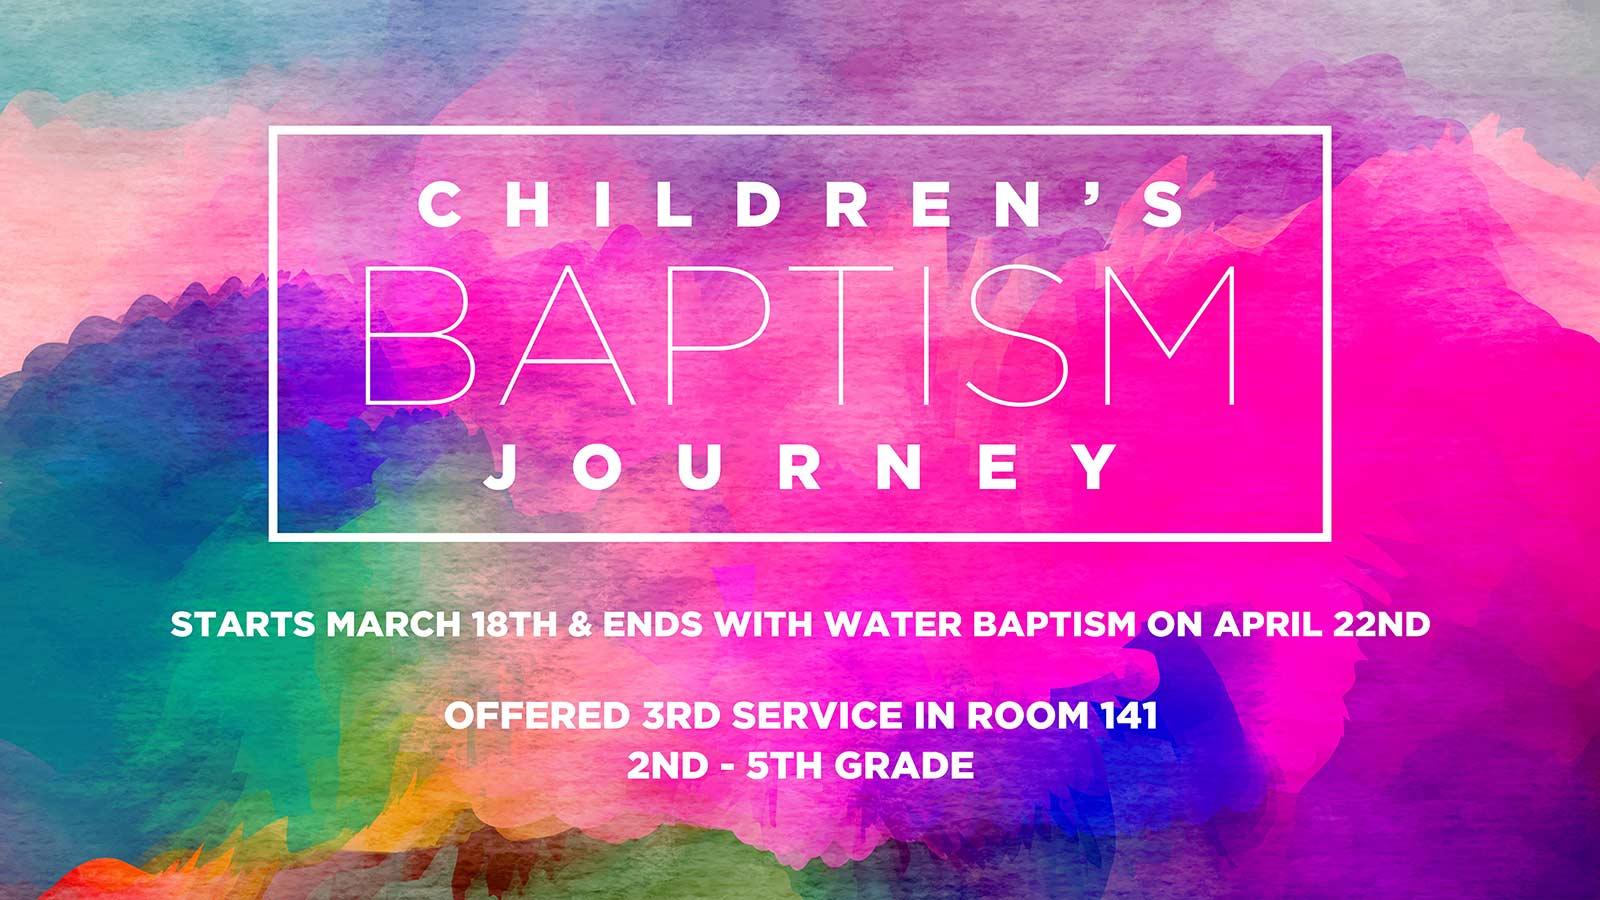 Children's Baptism Journey